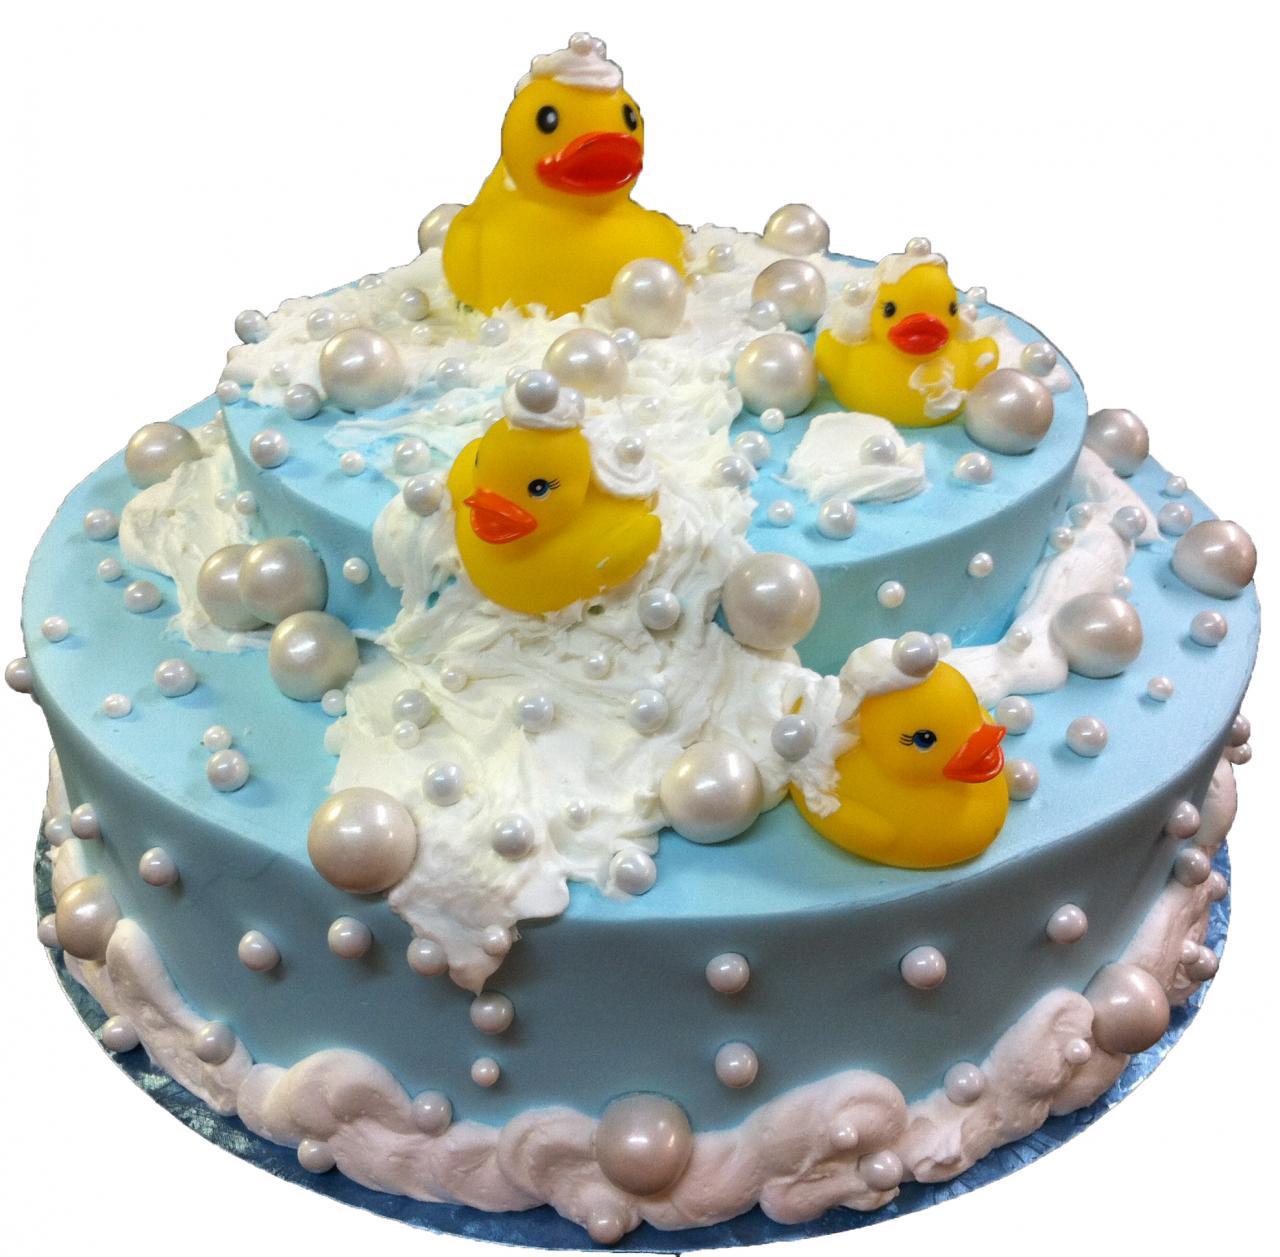 Raccoon Cake Cake Ideas And Designs